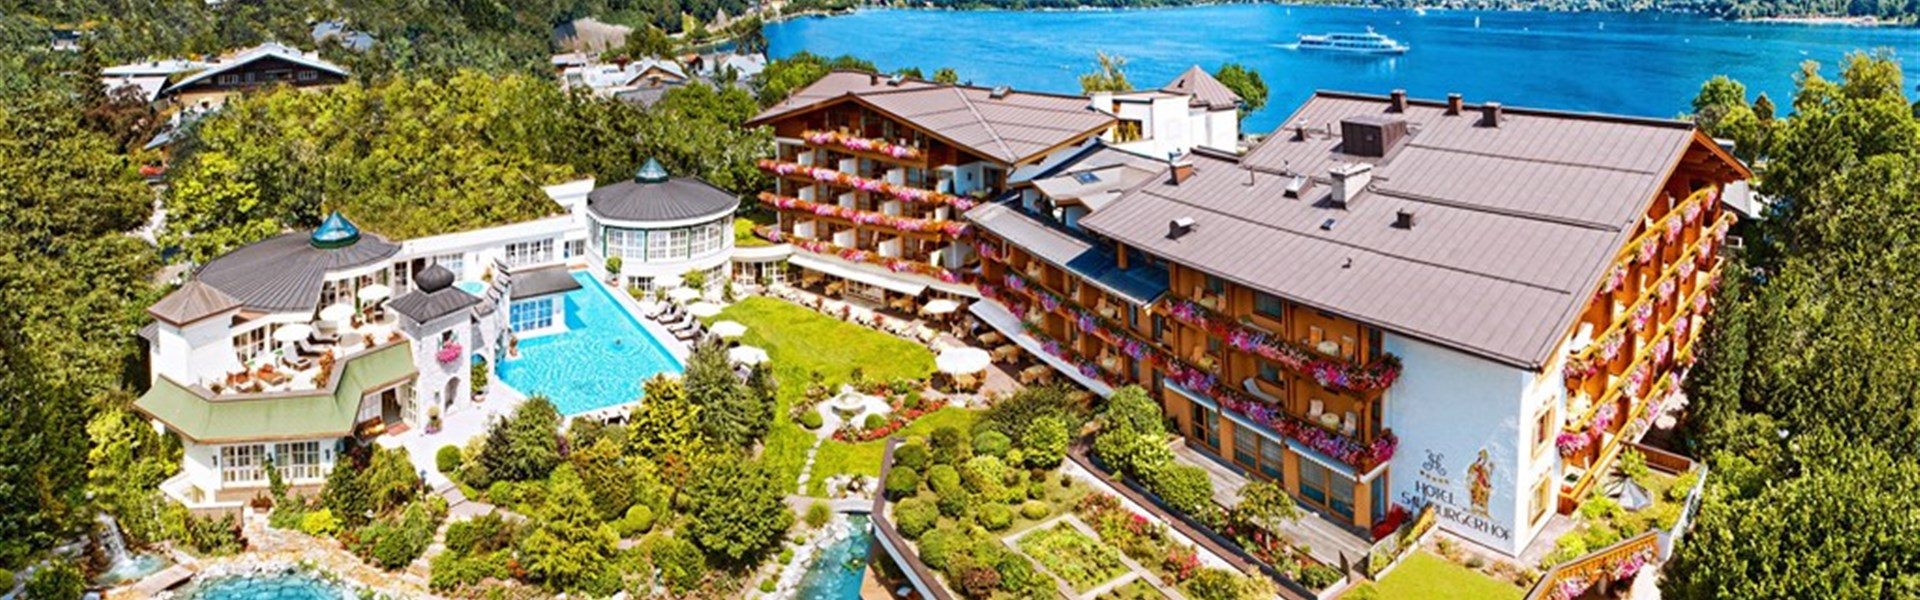 Hotel Salzburgerhof -